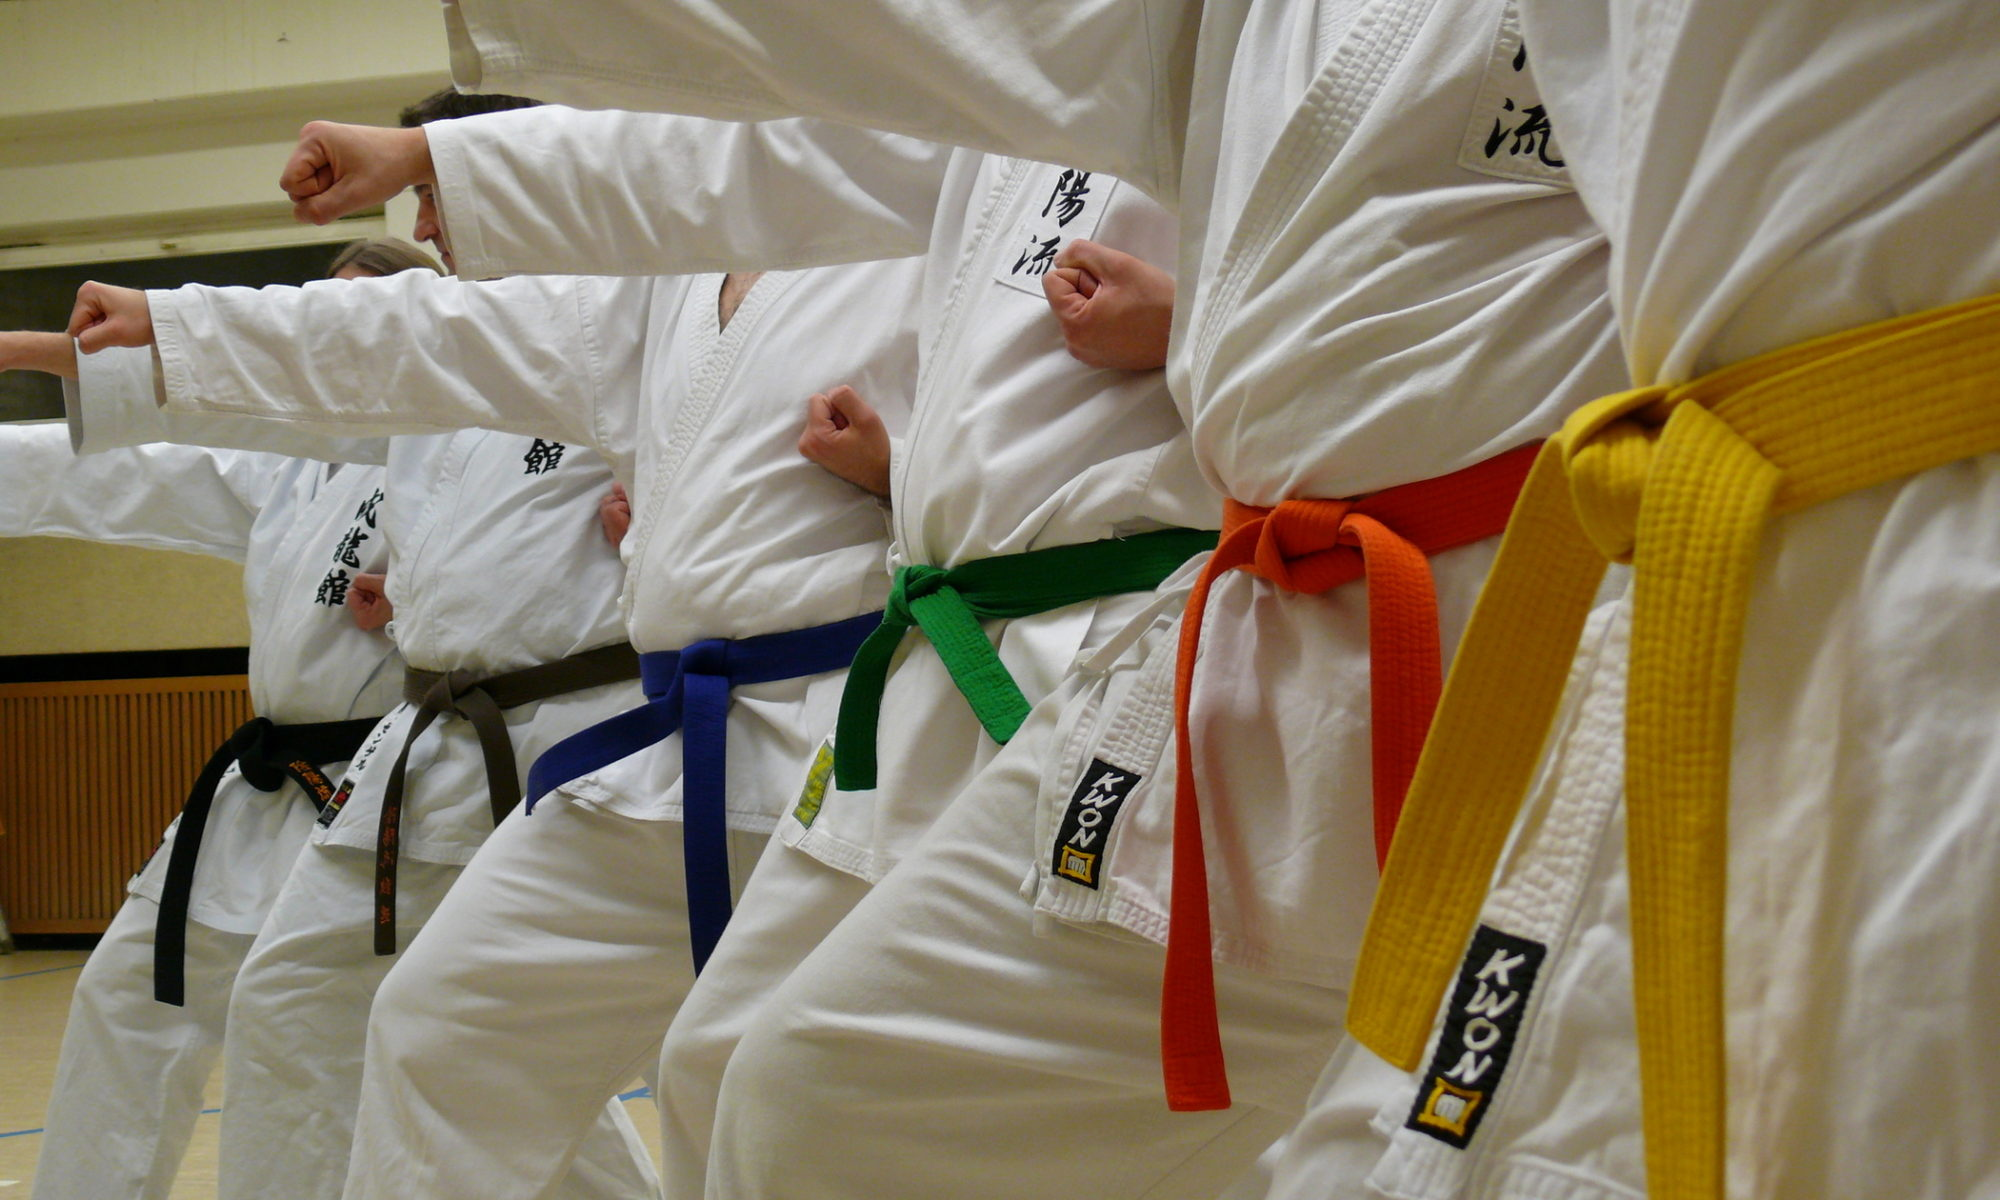 Inyo-Ryu Karate e.V. Düsseldorf